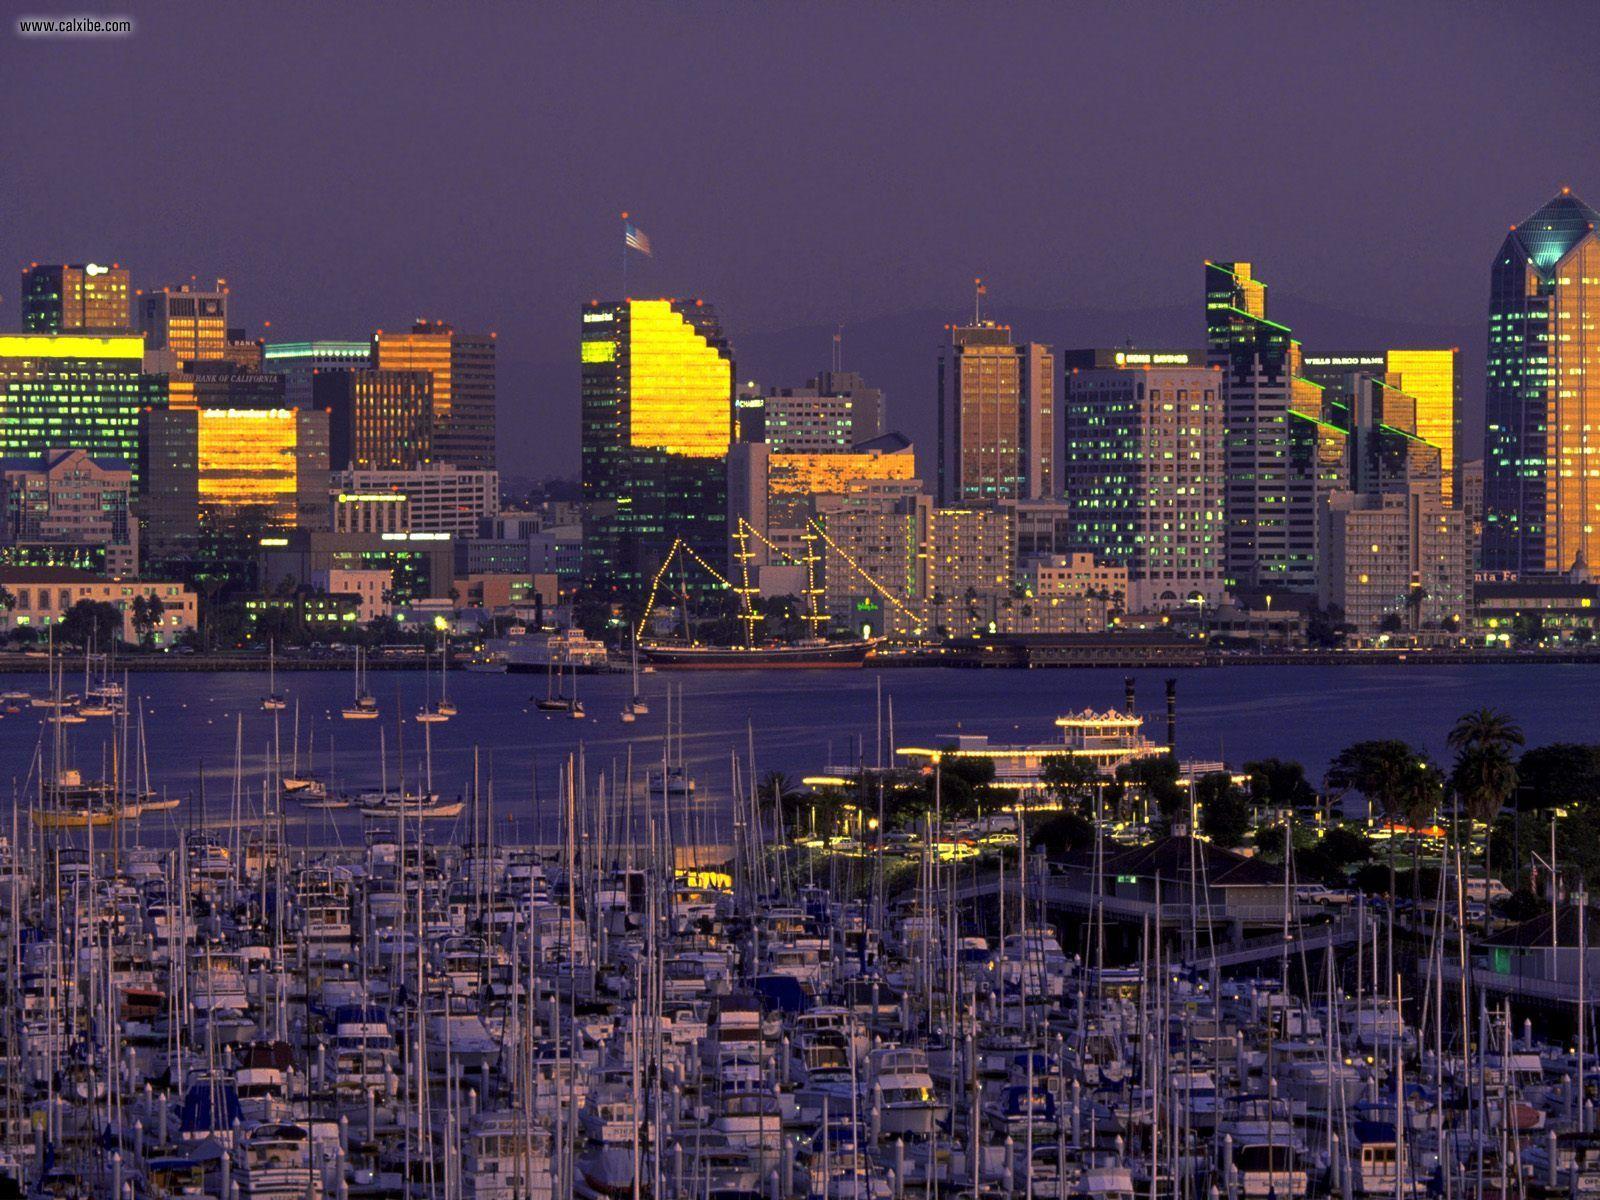 San Diego California Wallpaper is a hi res Wallpaper for 1600x1200